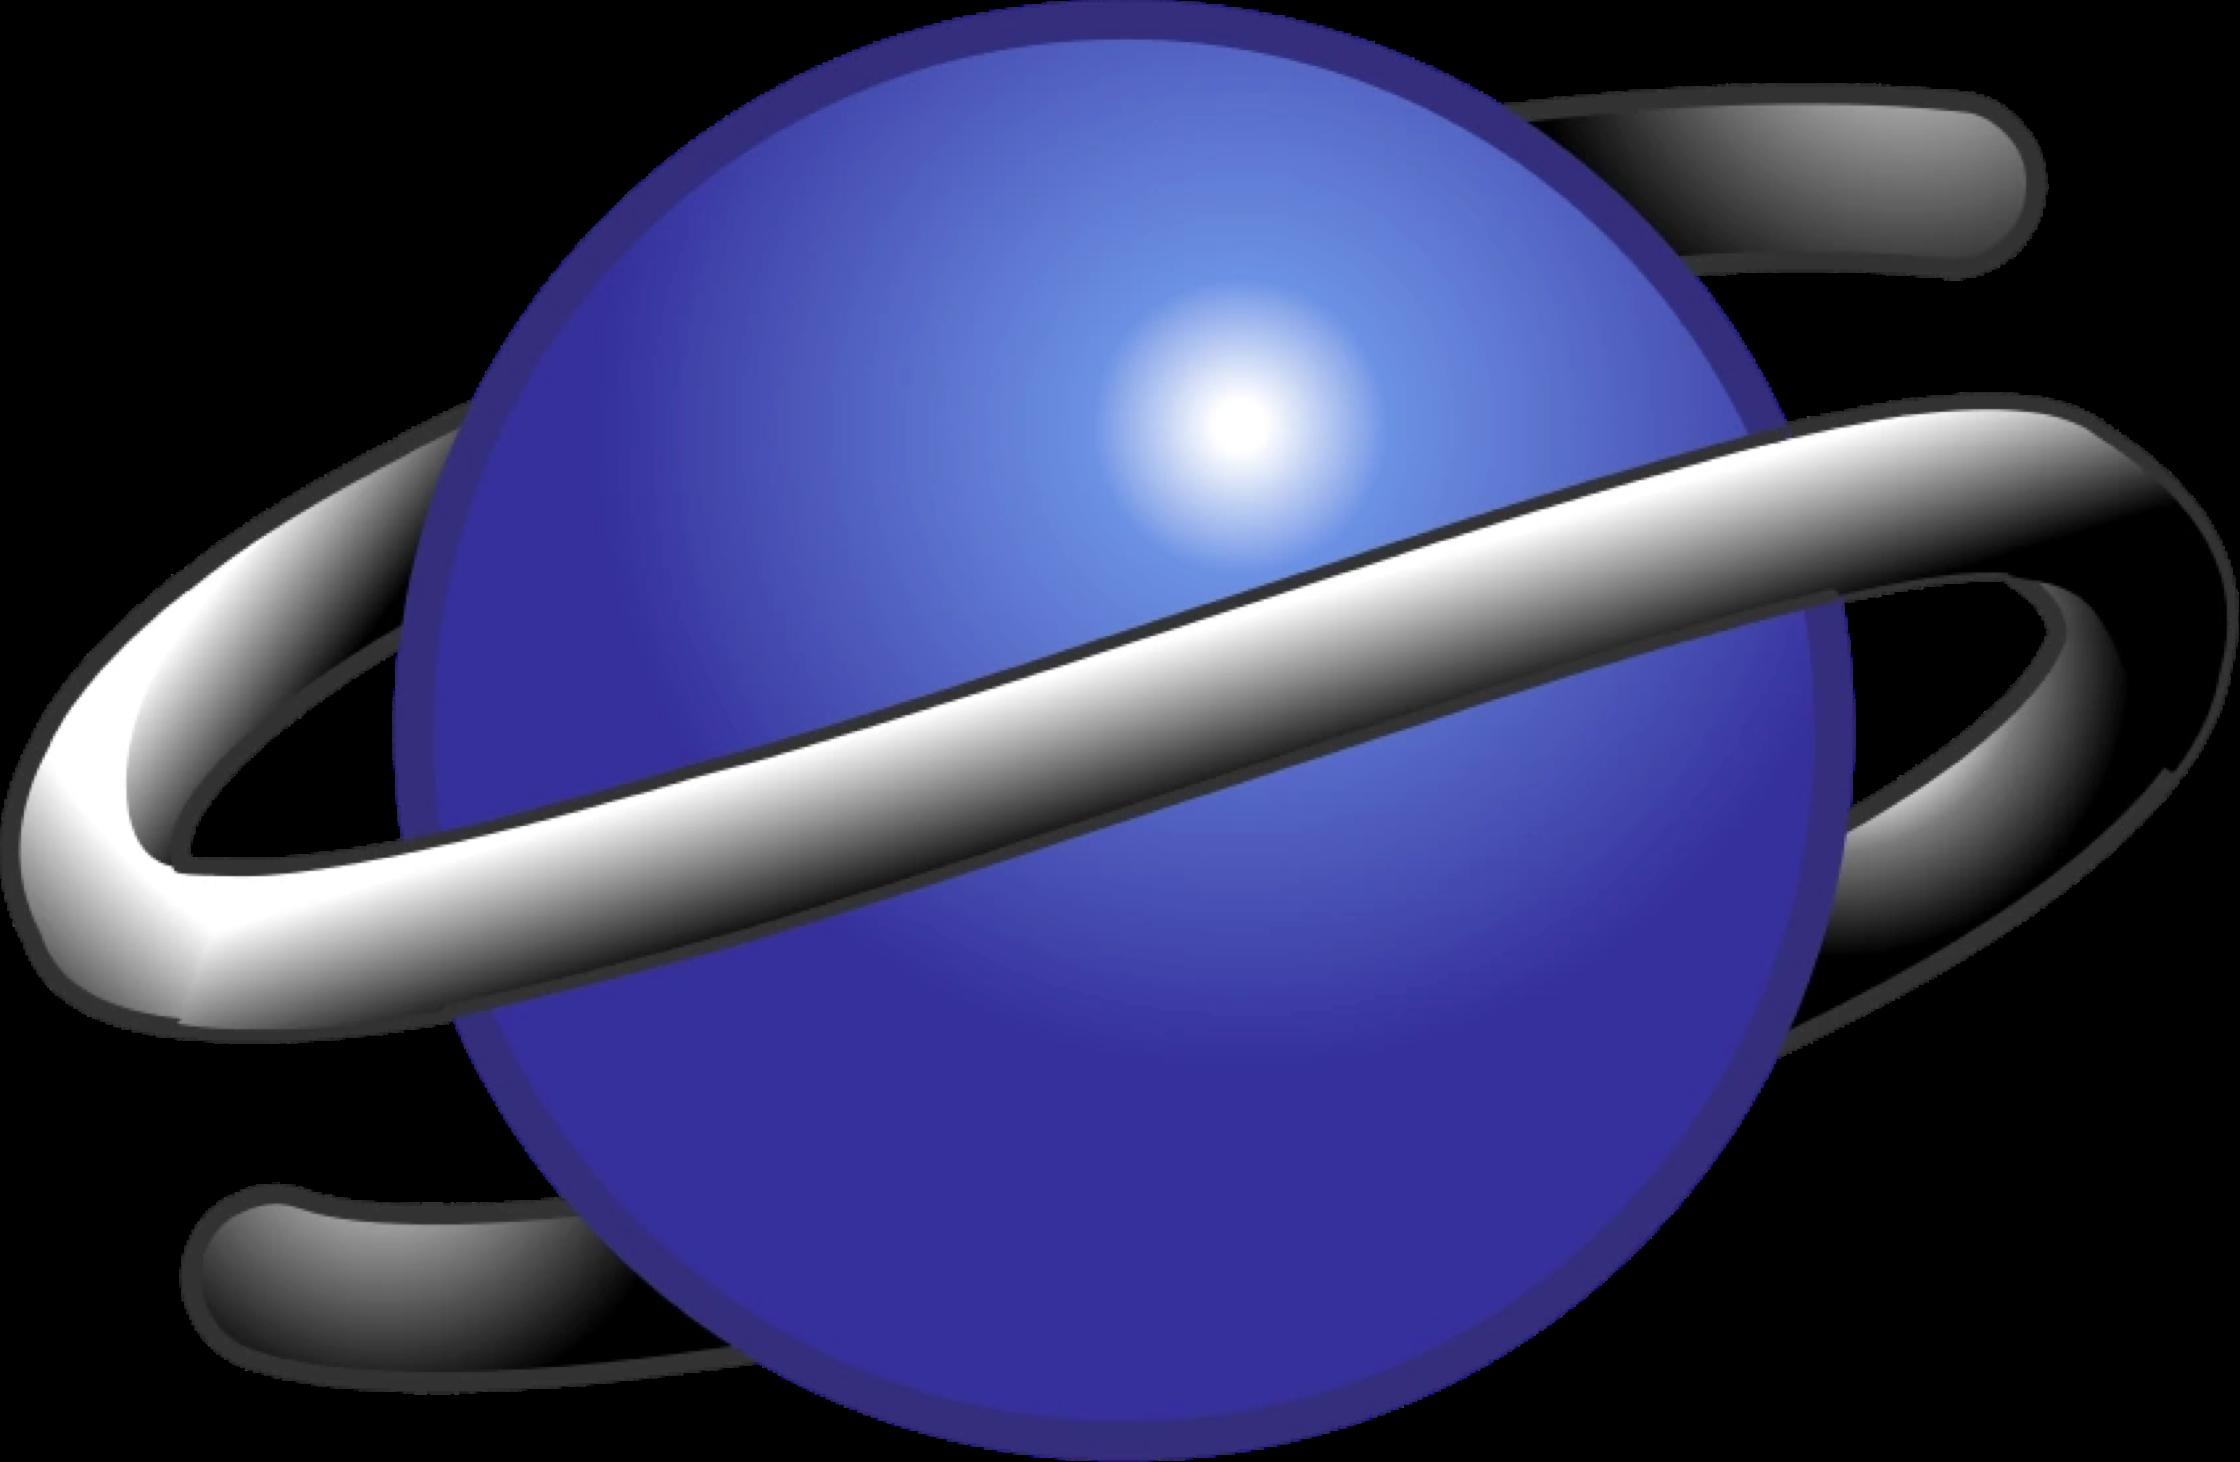 Saturn clipart purple. Sega super nintendo entertainment